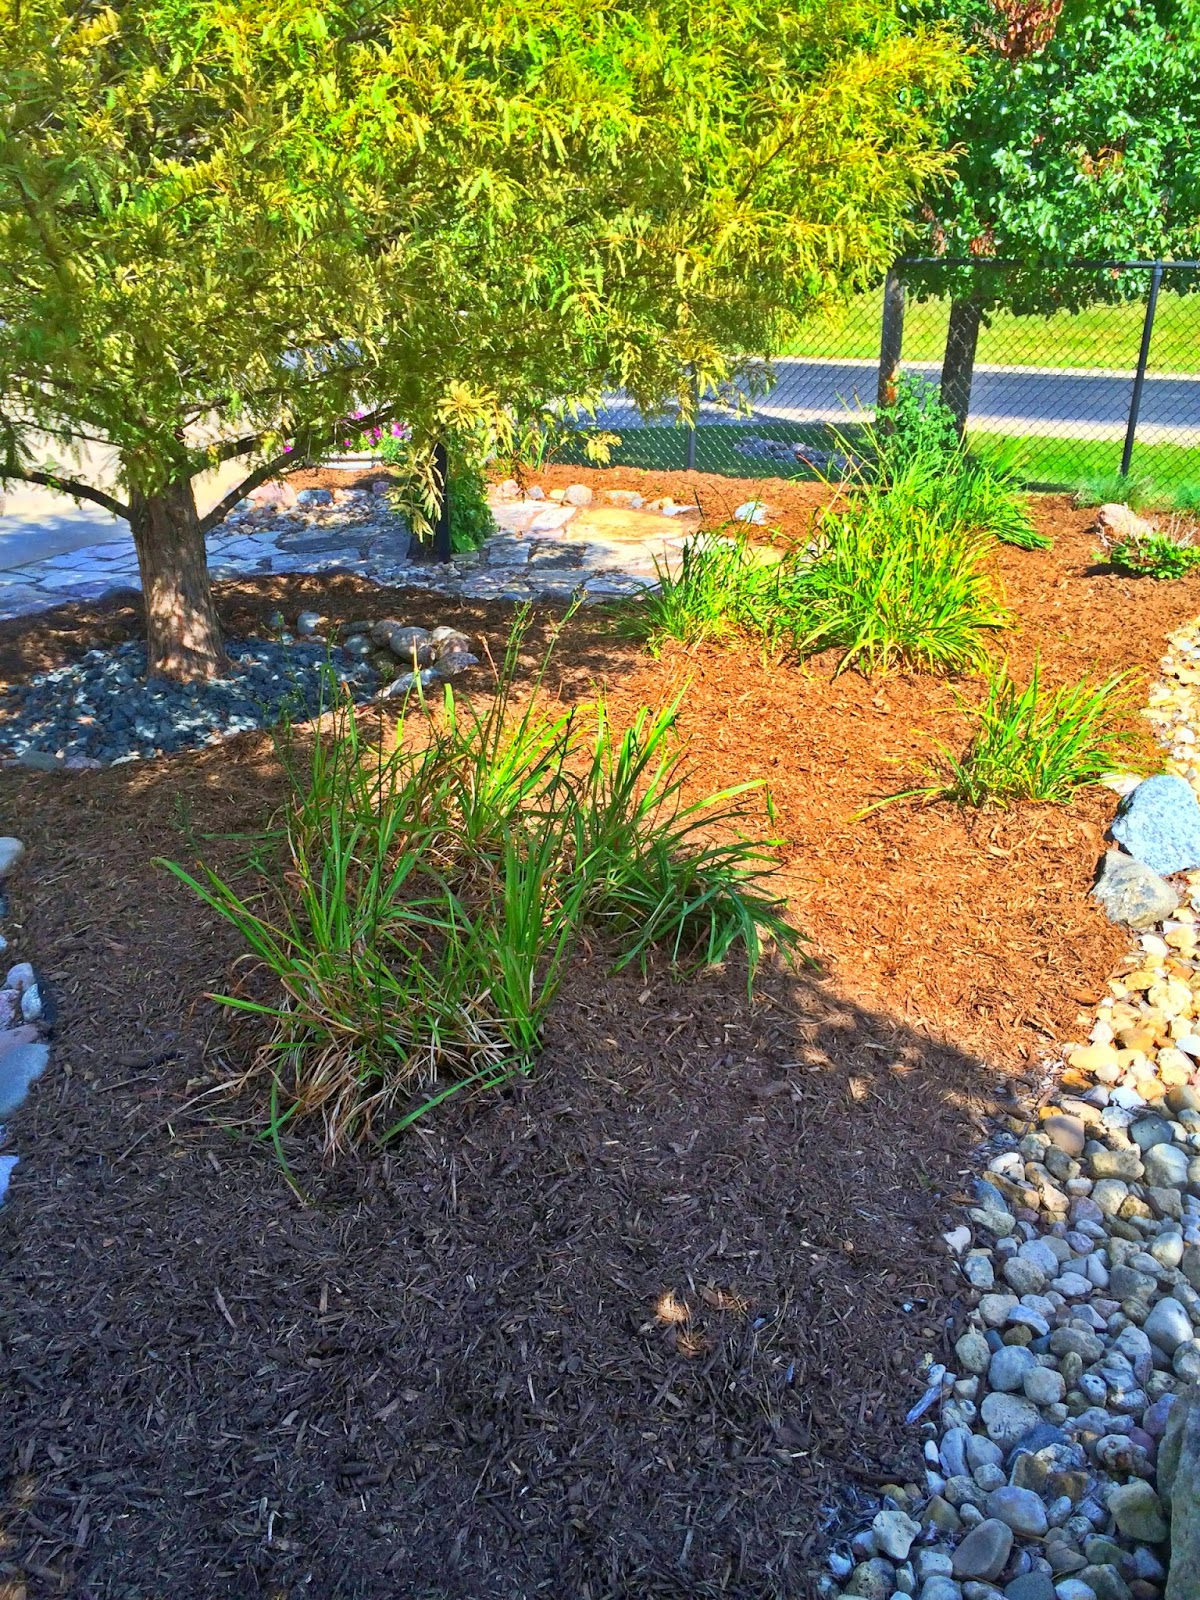 Landscaping Quad Cities - Landscaping In Quad Cities